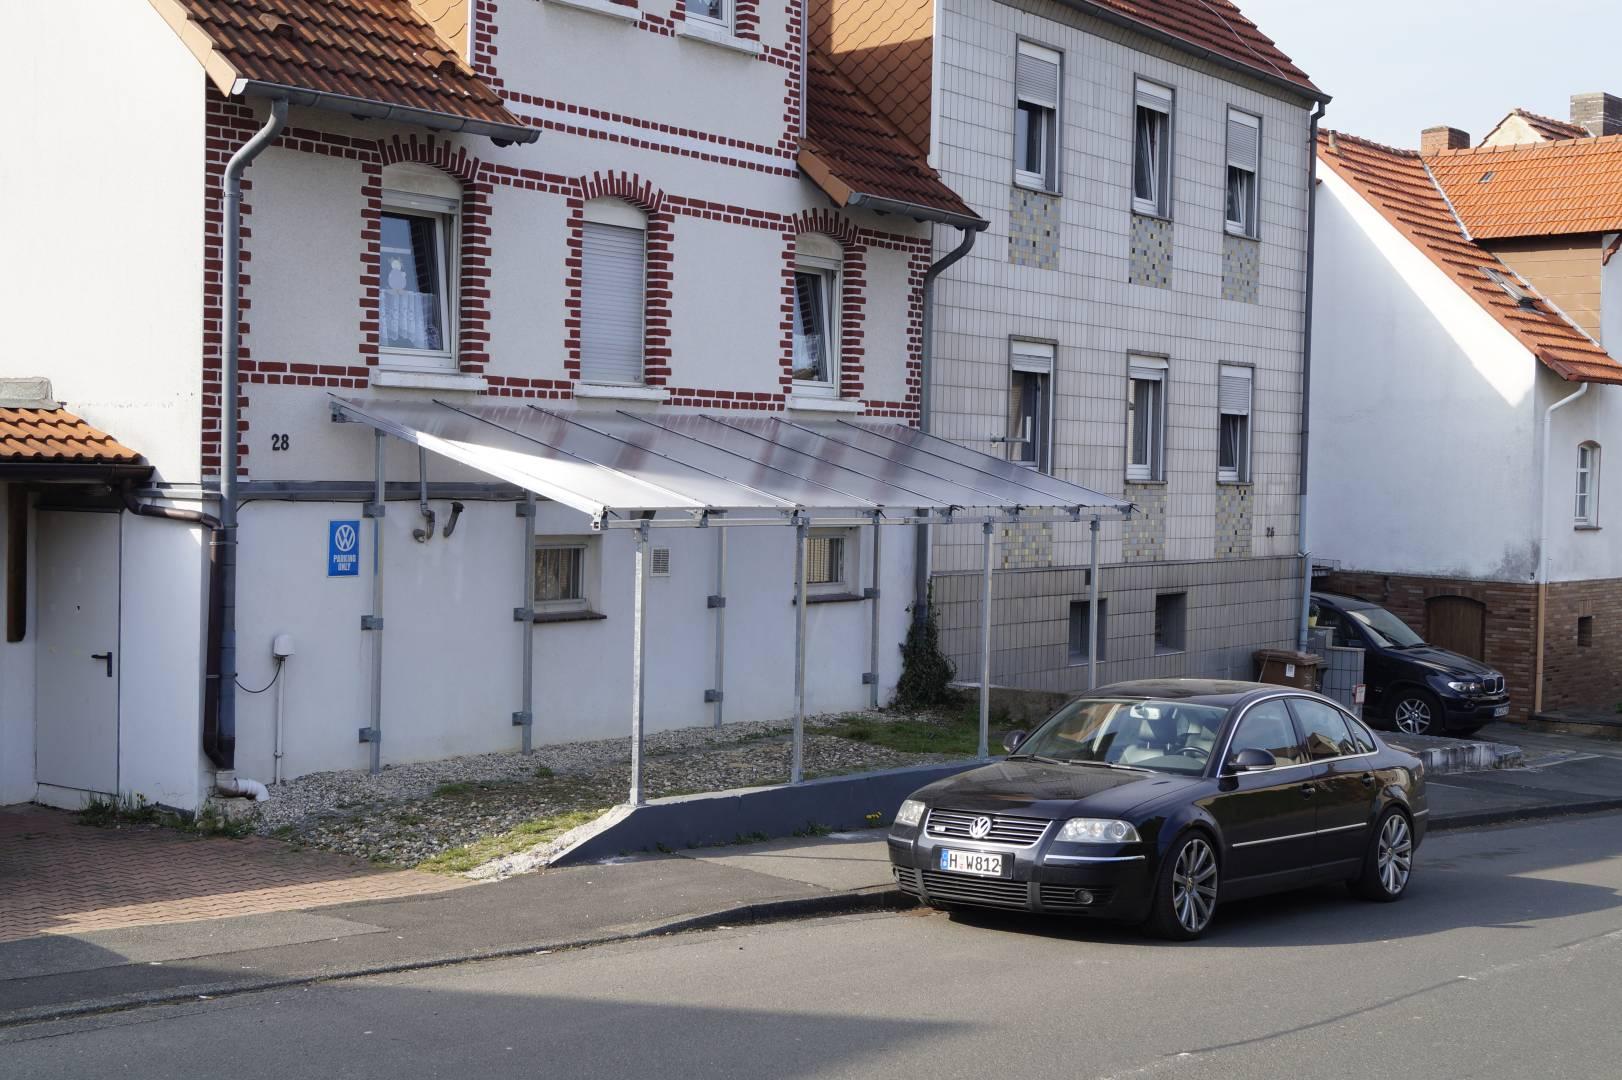 Carport_Aufbau_E01.jpg